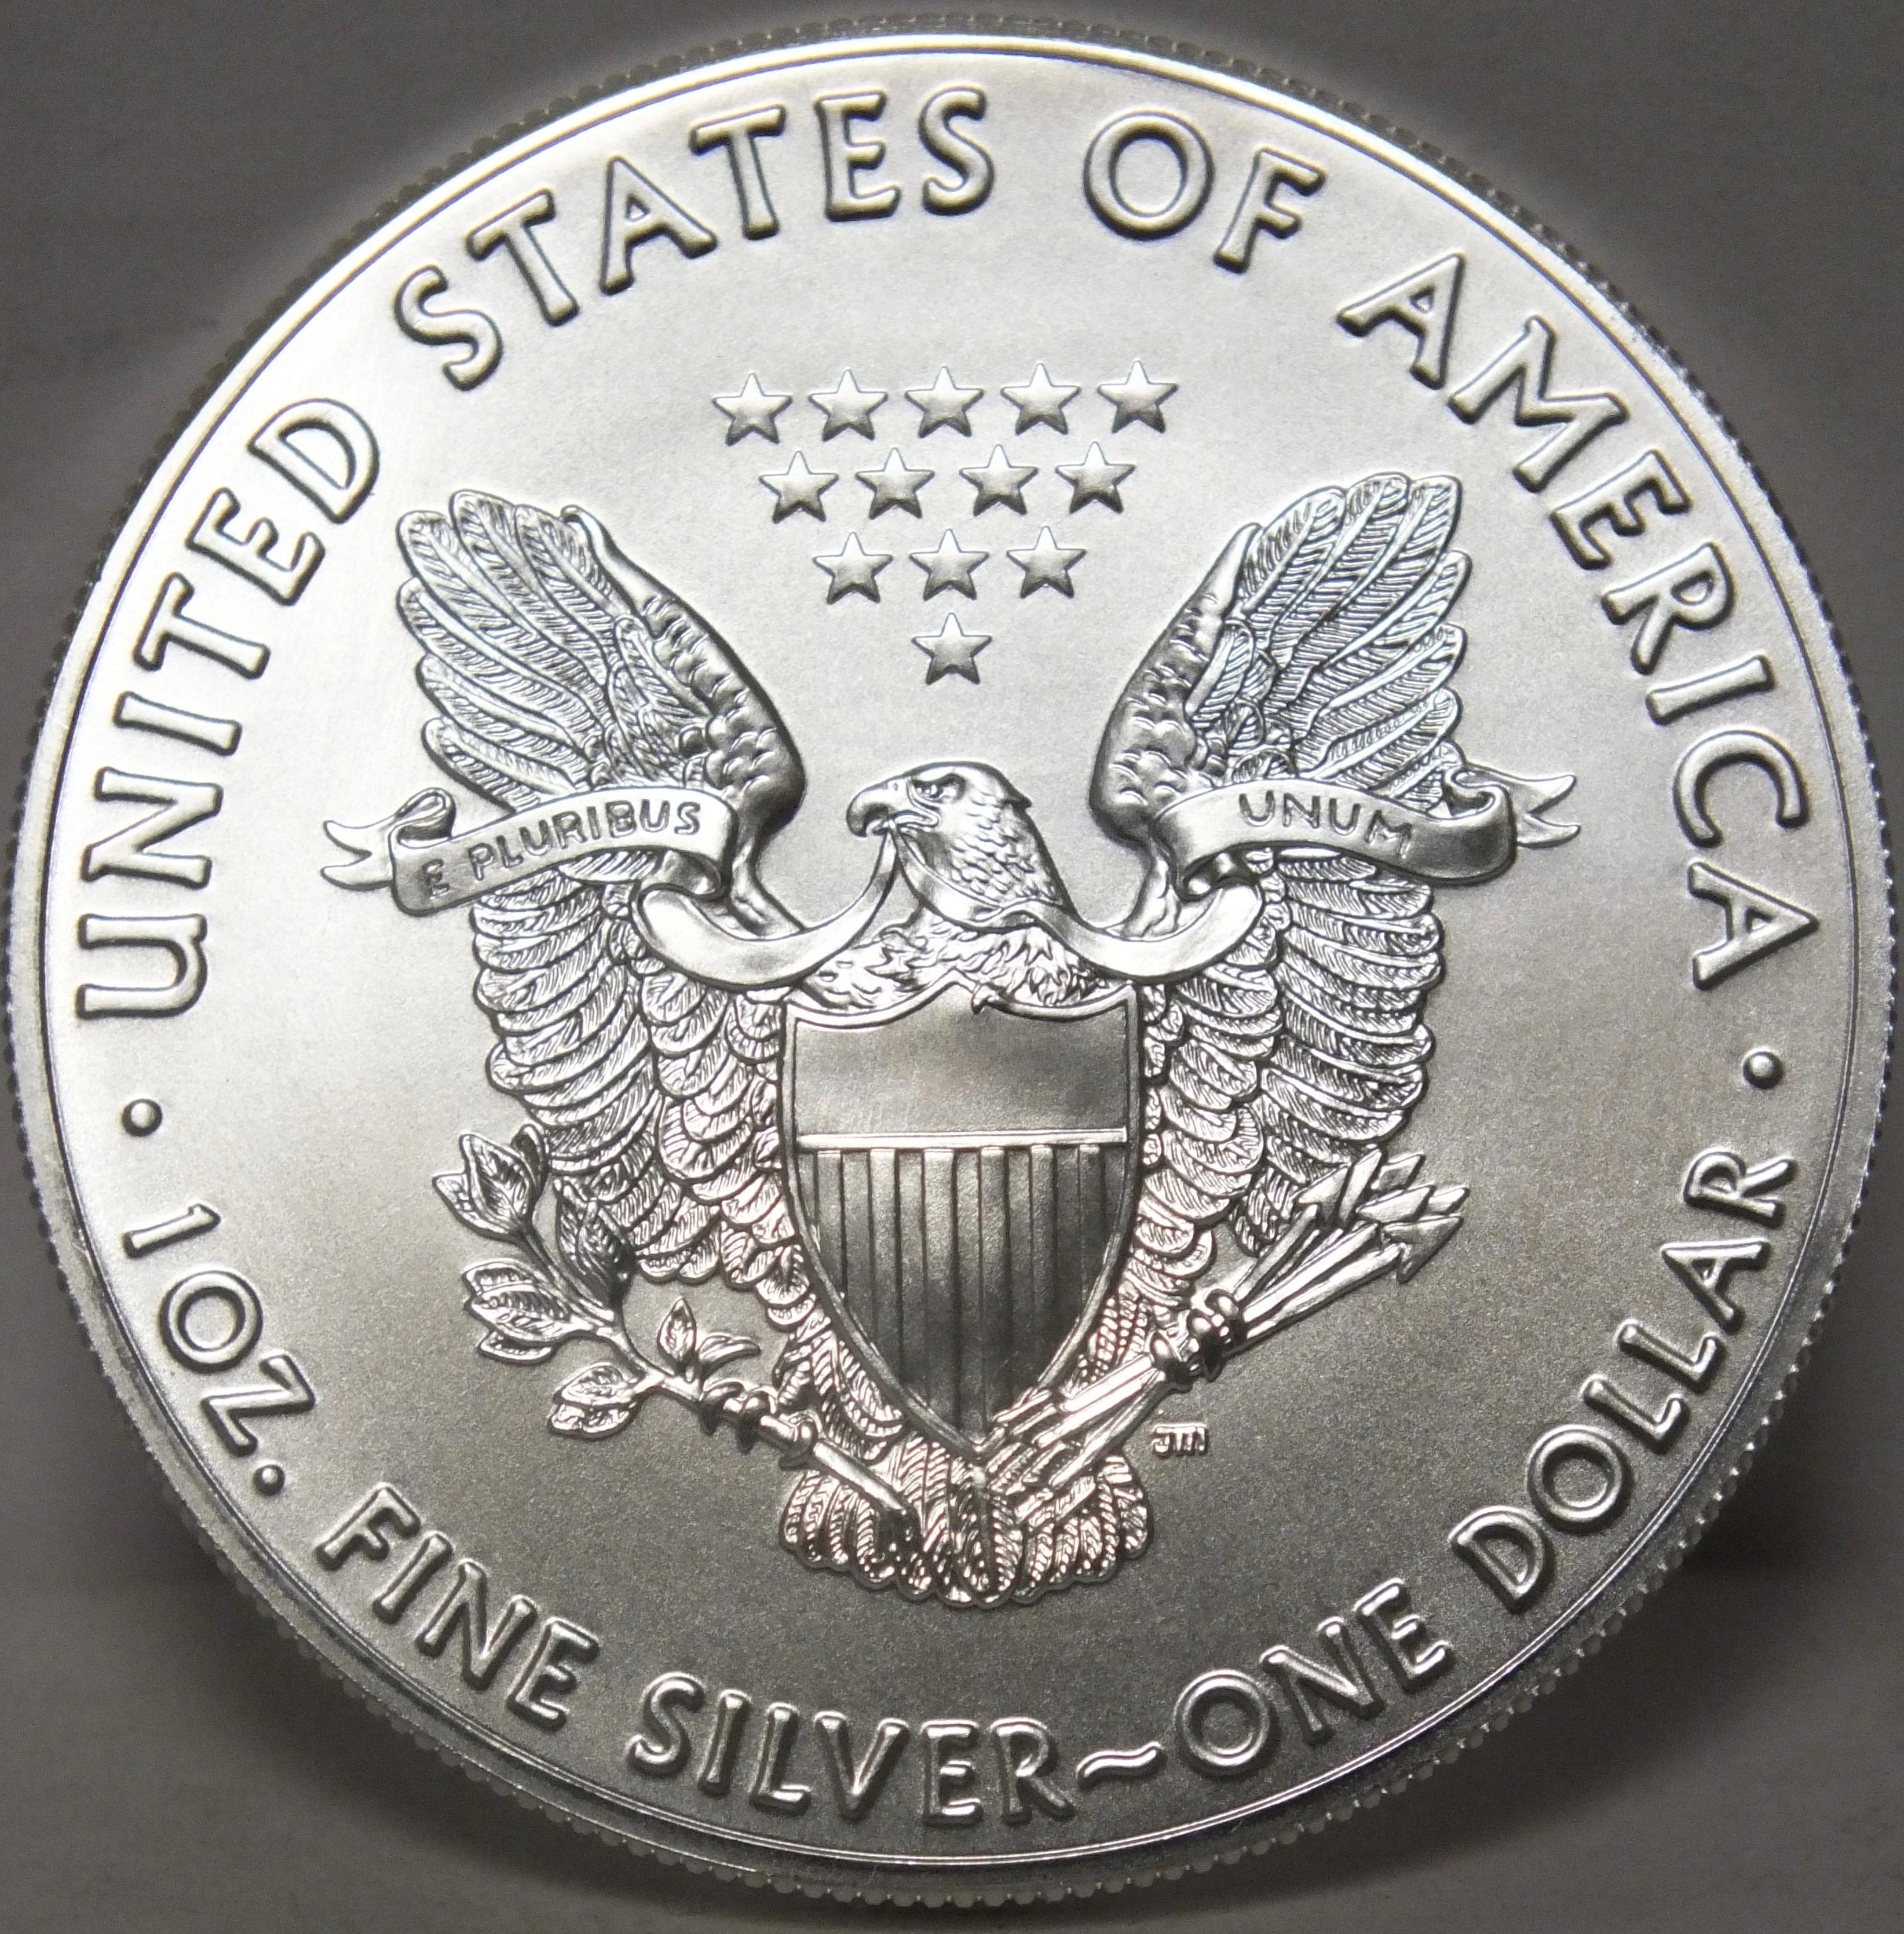 2018 American Silver Eagle Coin 1 Oz .999 Fine Silver $1 One Dollar ...